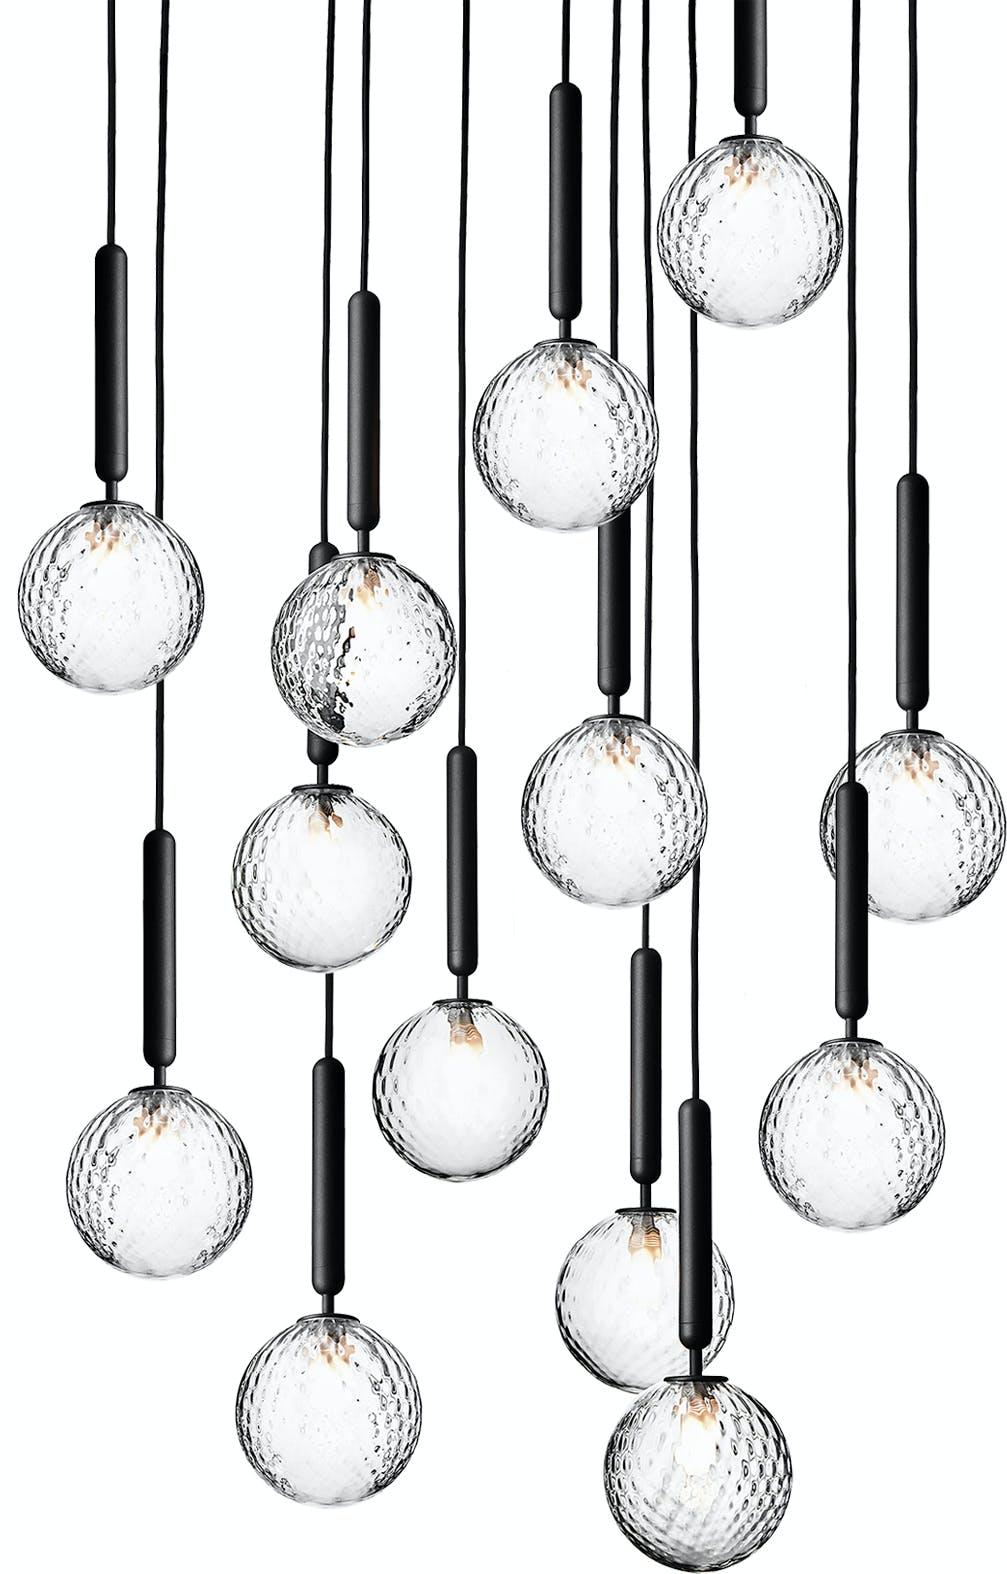 nuura miira 13 chandelier thumb haute living